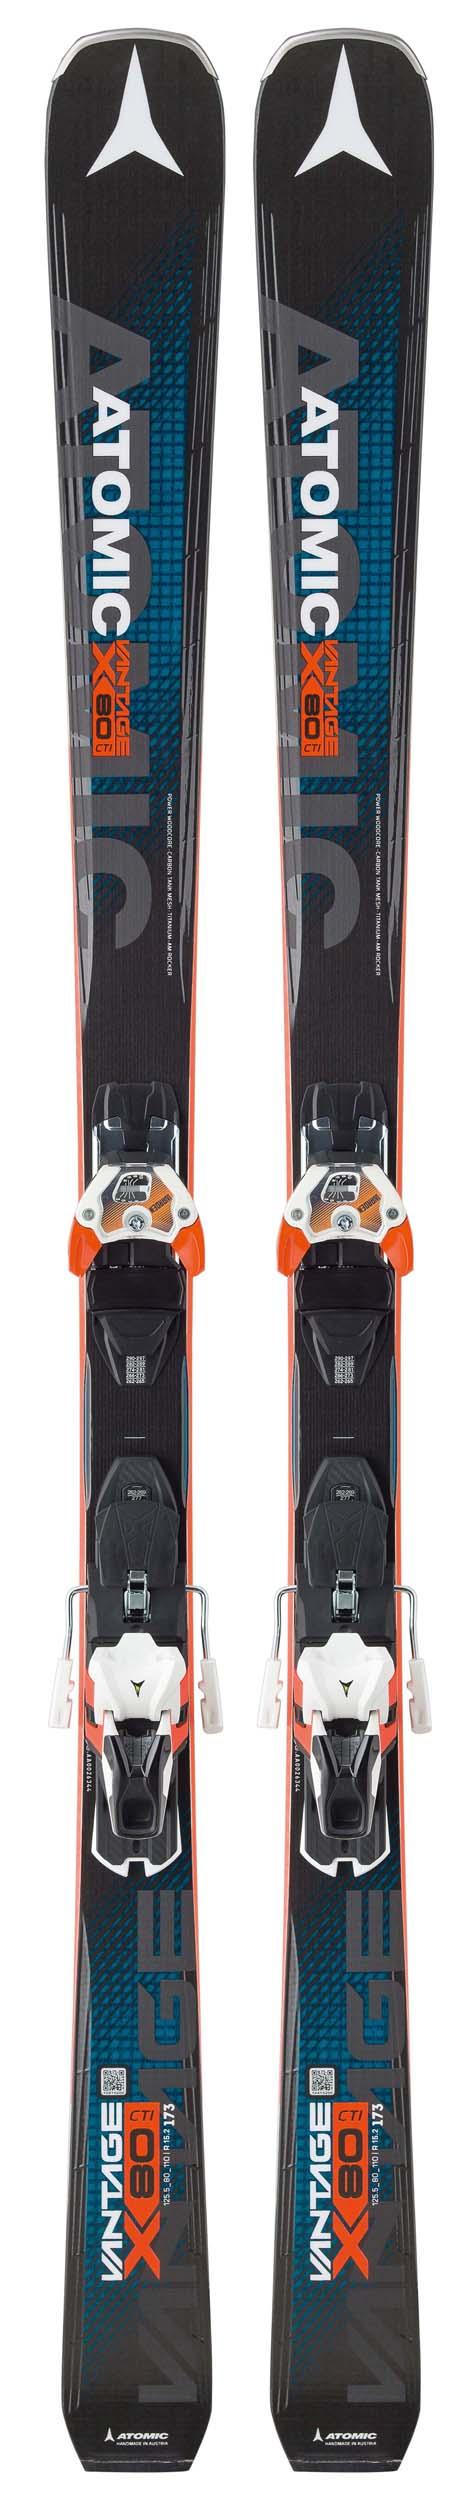 Atomic 2018 Vantage X 80 CTI Skis w/ Warden 13 DT Bindings NEW !! 166,173,180cm